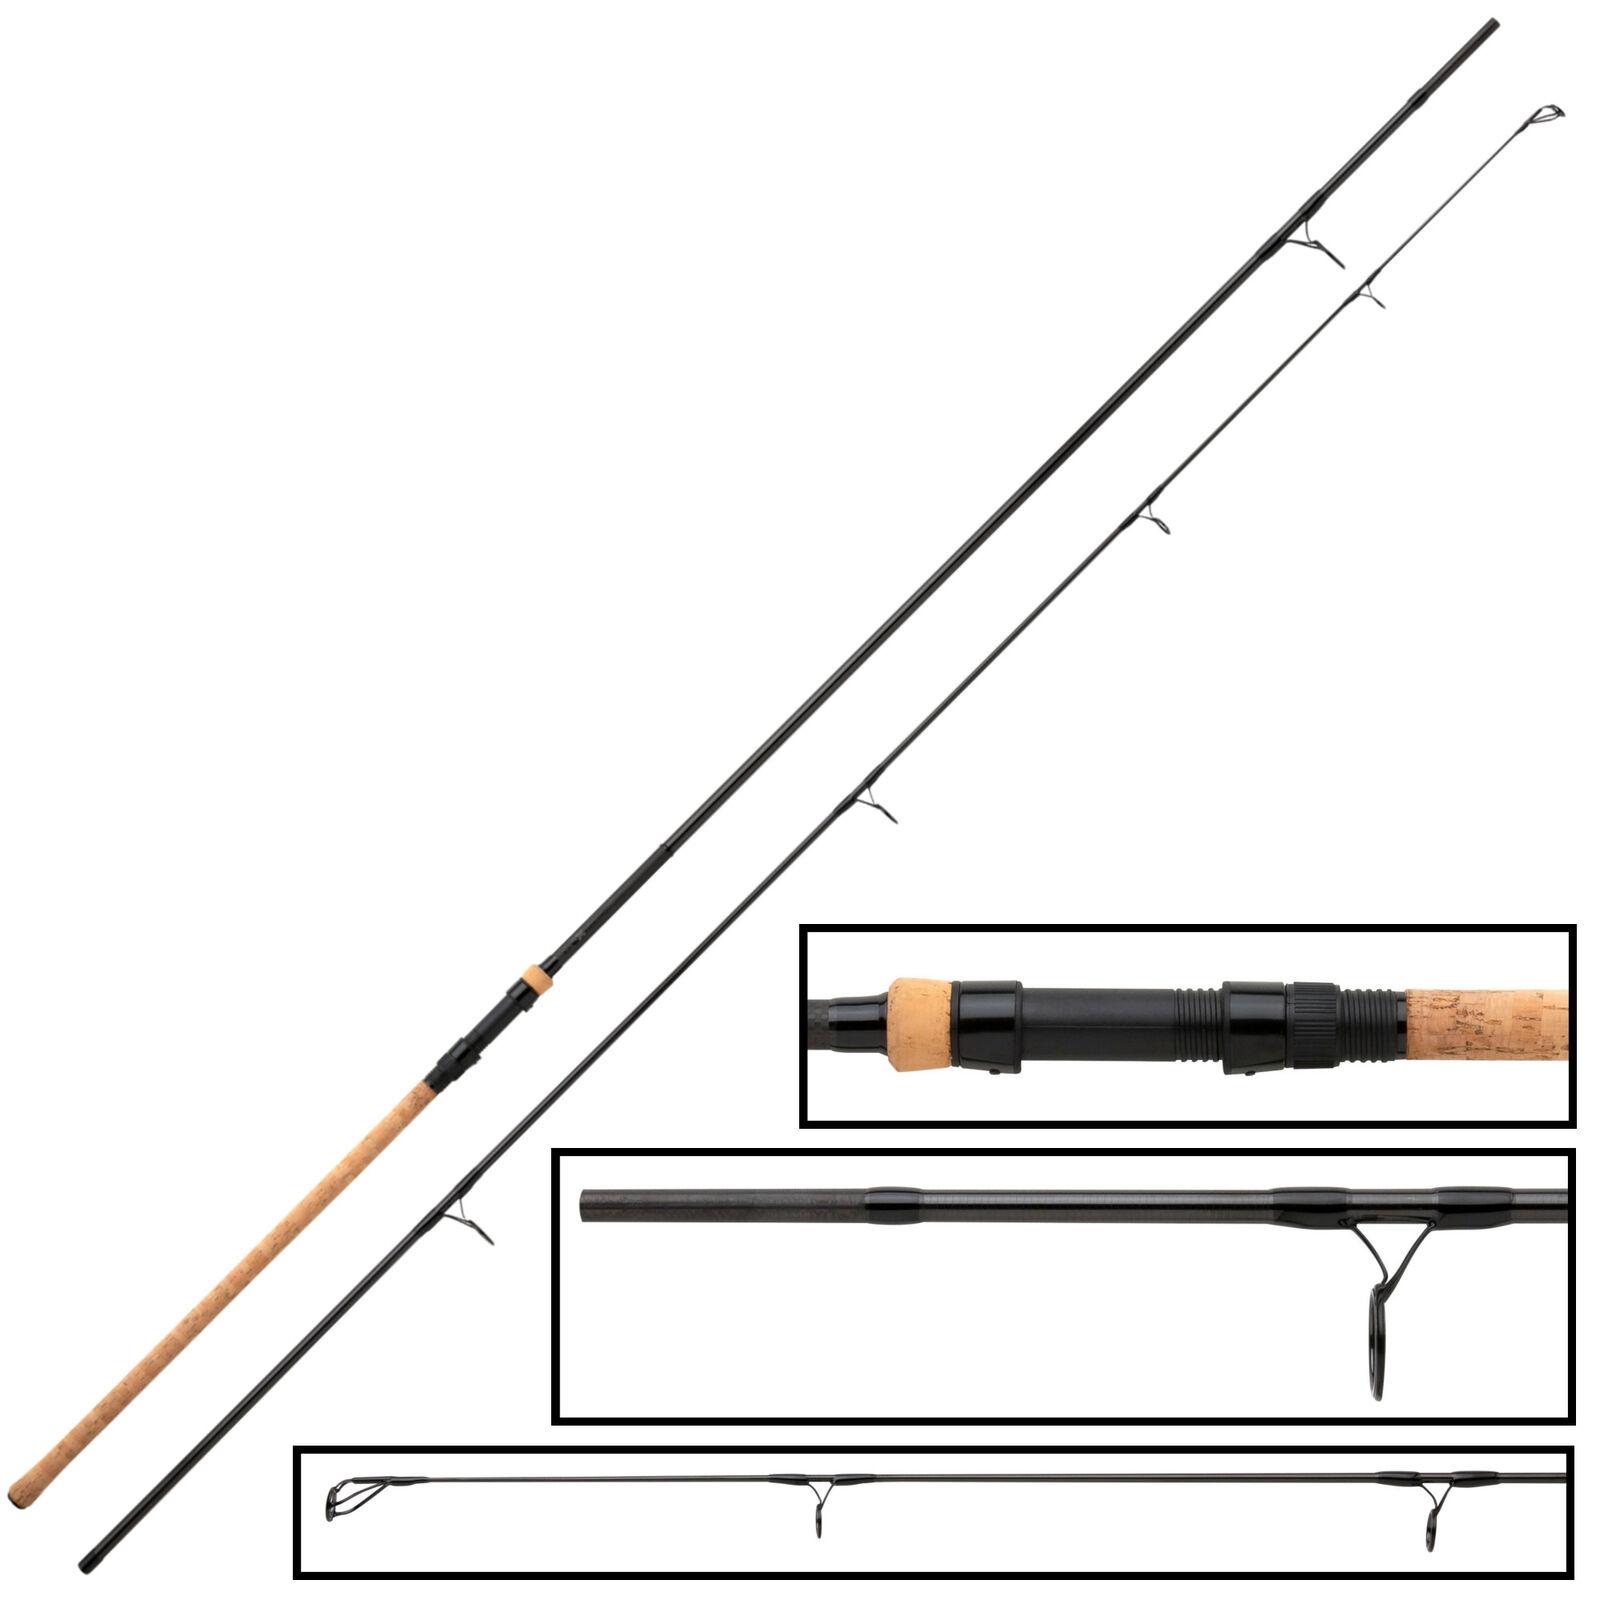 Fox X3 Horizon cork handle 12ft 3lb - Karpfenrute, Karpfenangel Grundrute, Karpfenangel Karpfenrute, 3b0f62